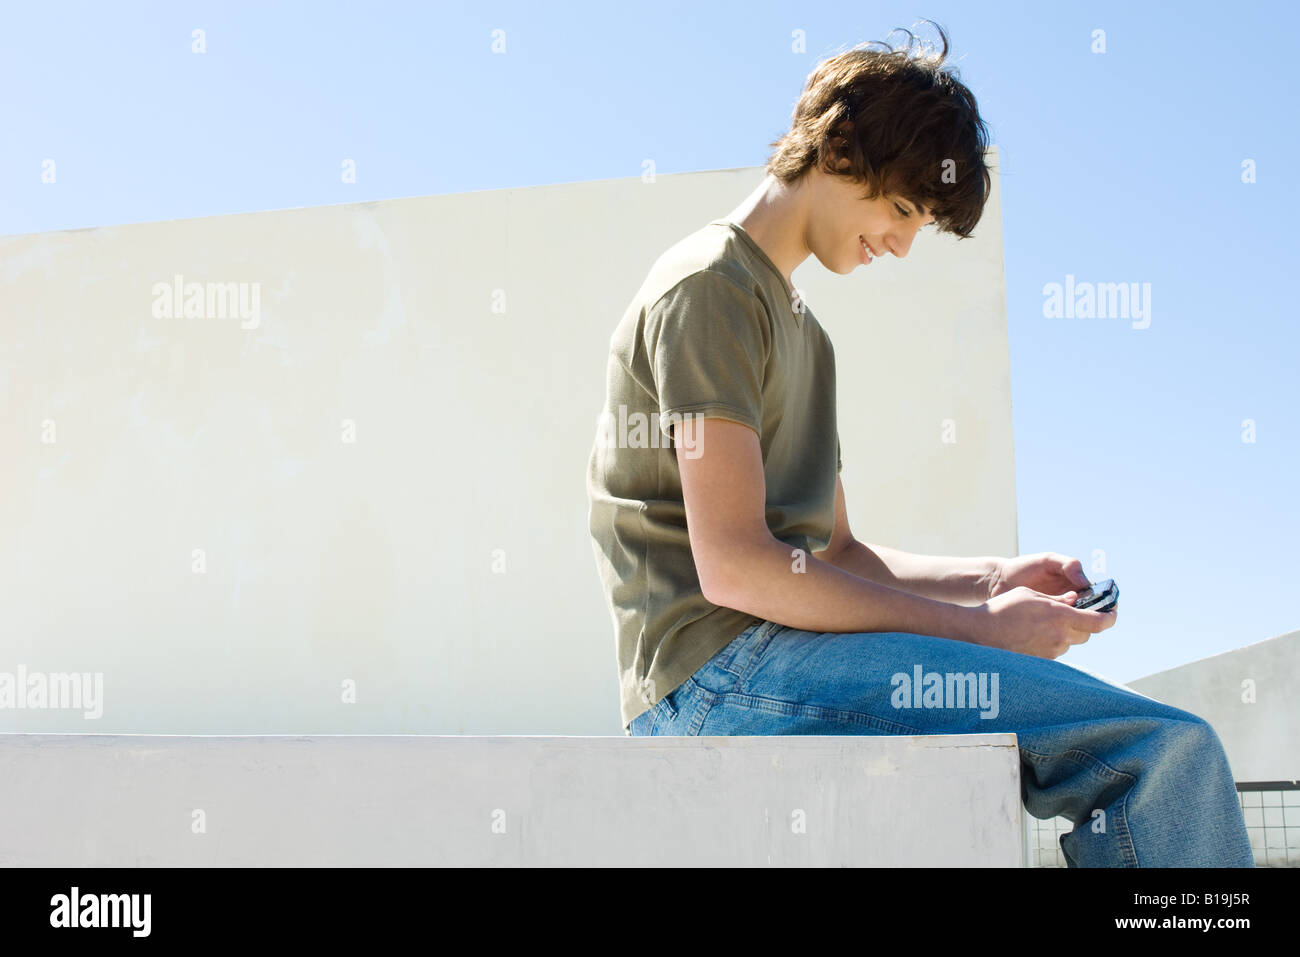 Teen boy playing handheld video game outdoors Stock Photo